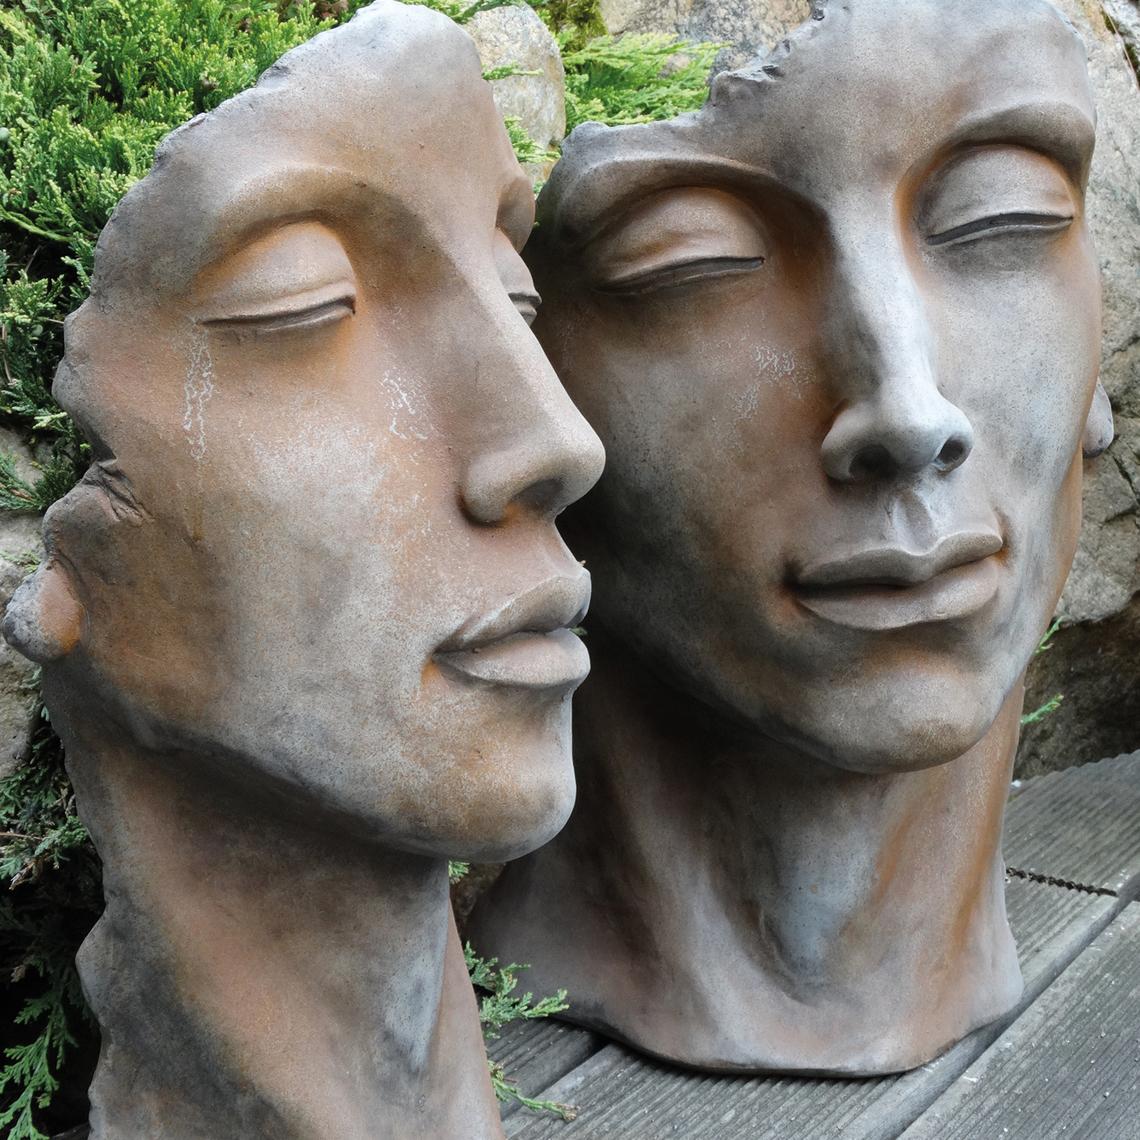 Chamorin concernant Statut De Jardin Pas Cher